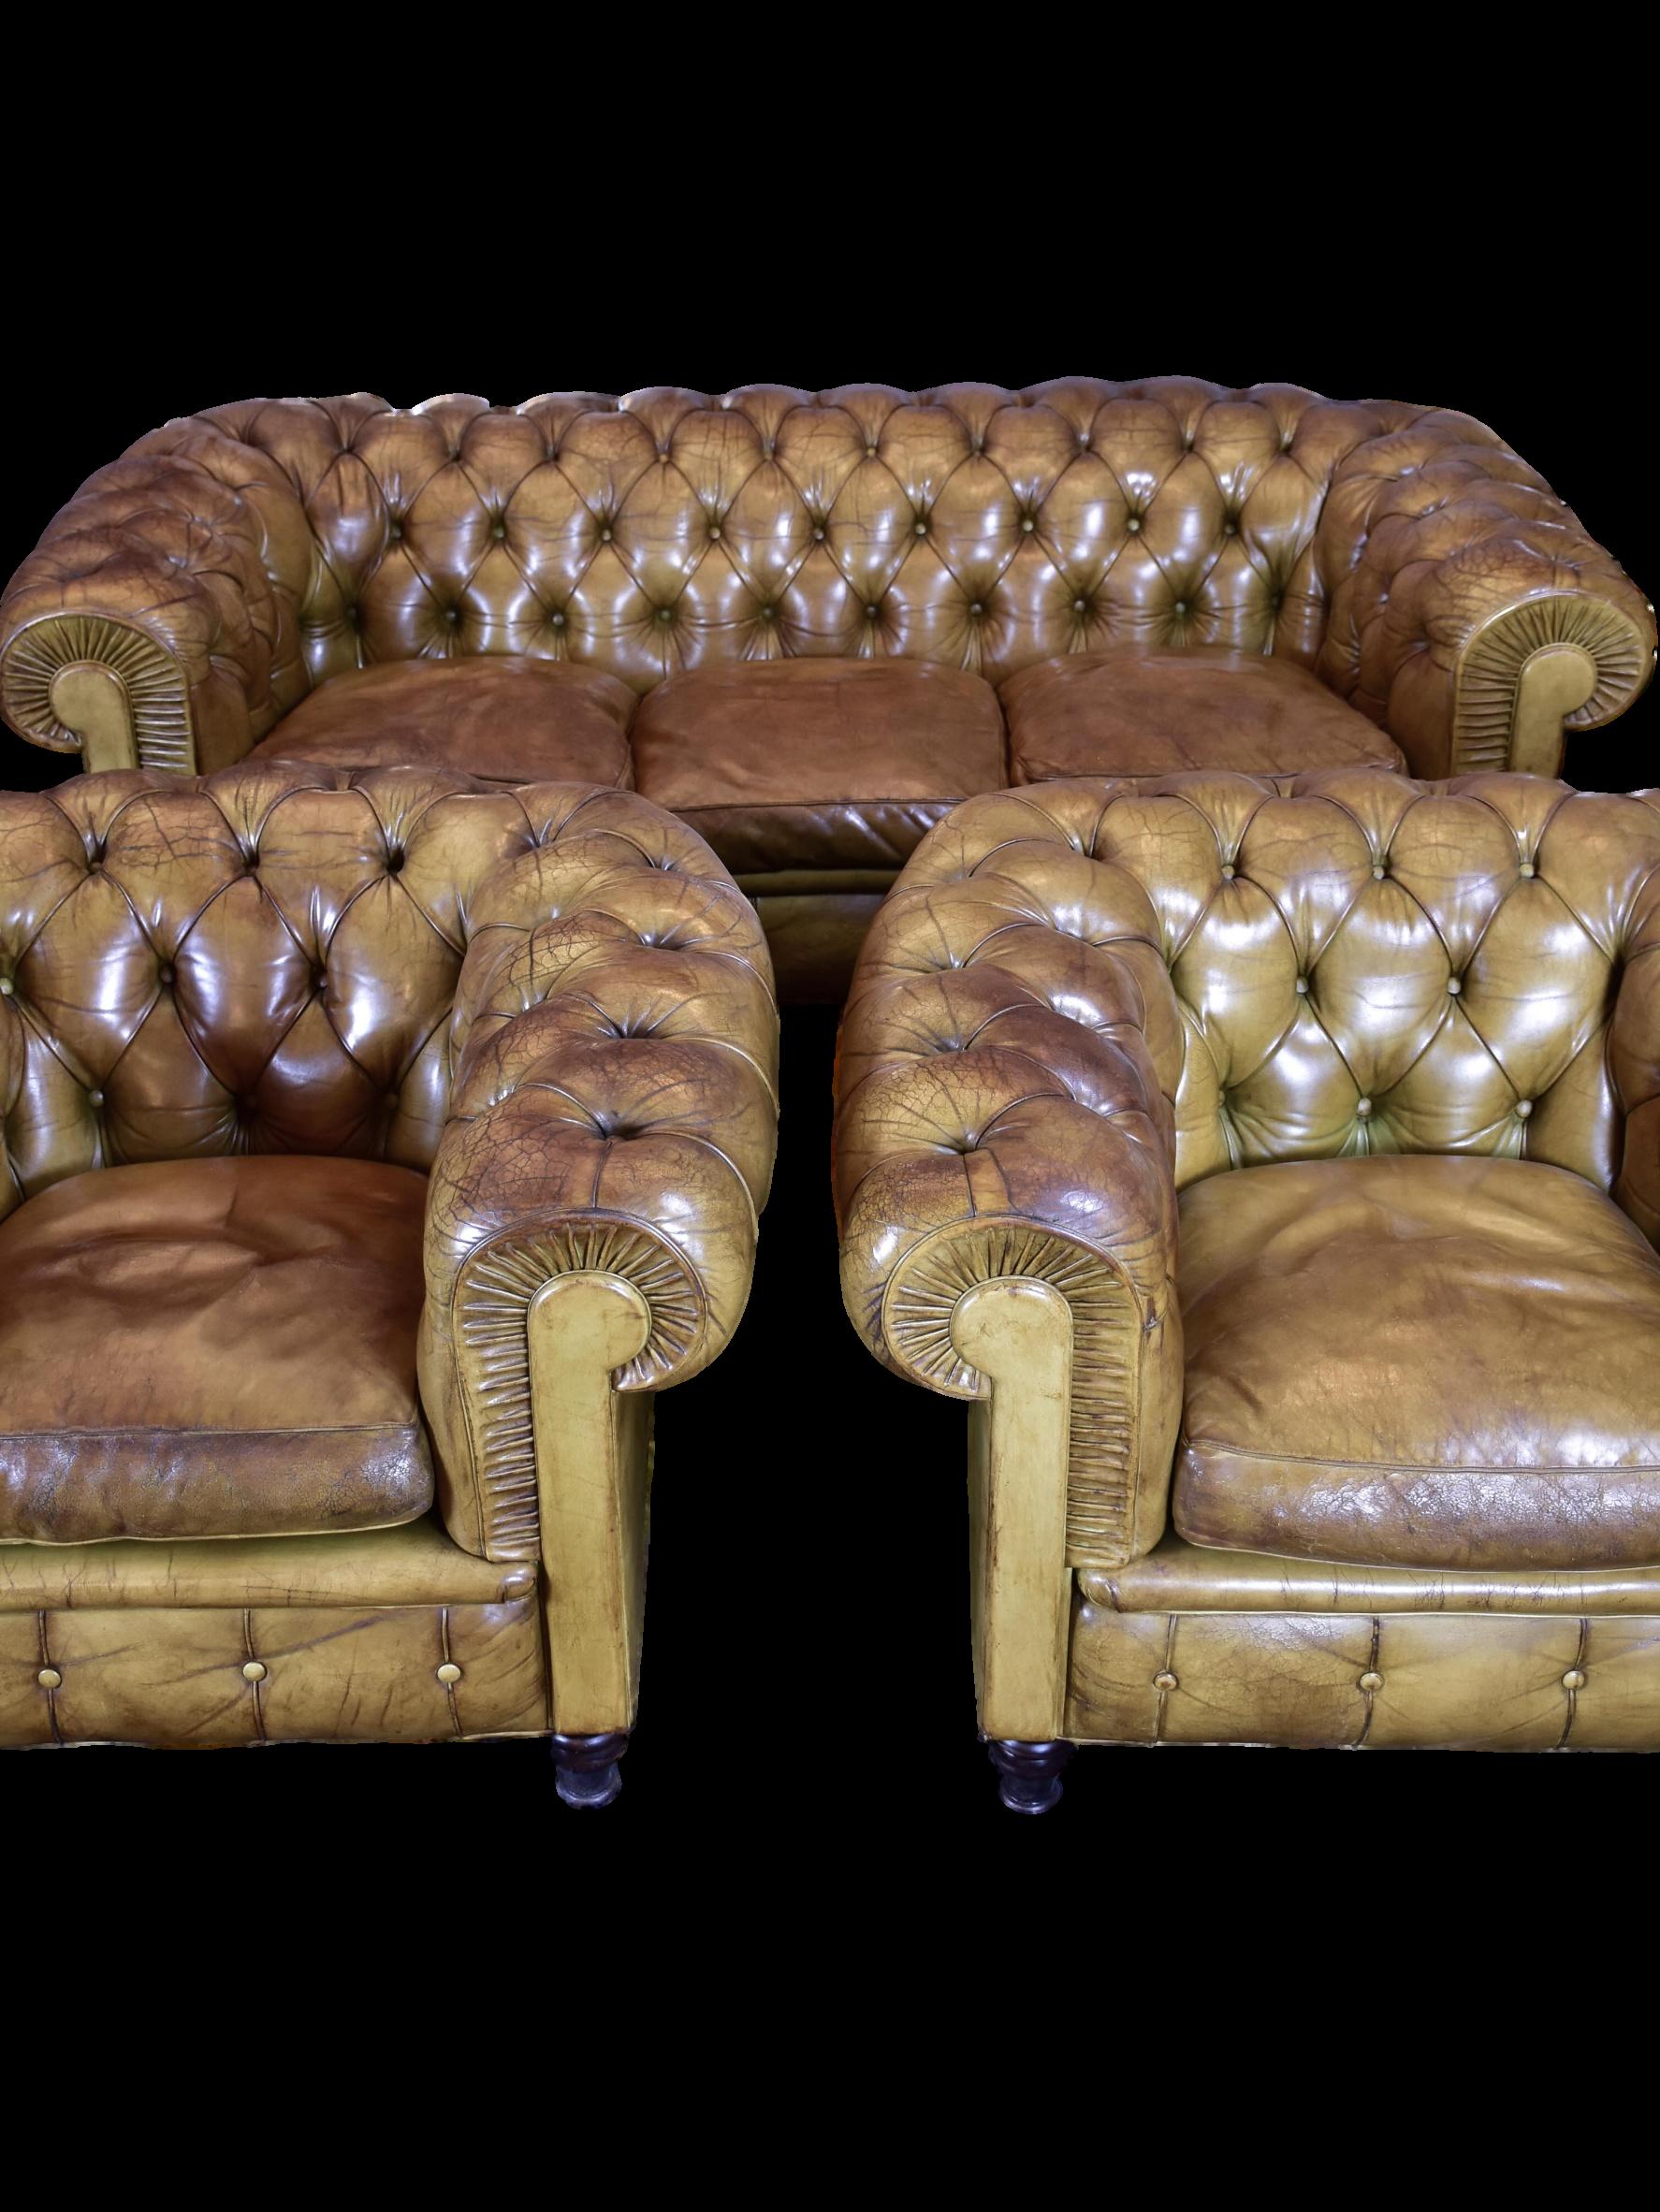 Italian Poltrona Frau Chesterfield Set Two Armchairs And Sofa Rustic Furniture Diy Furniture Chesterfield Sofa